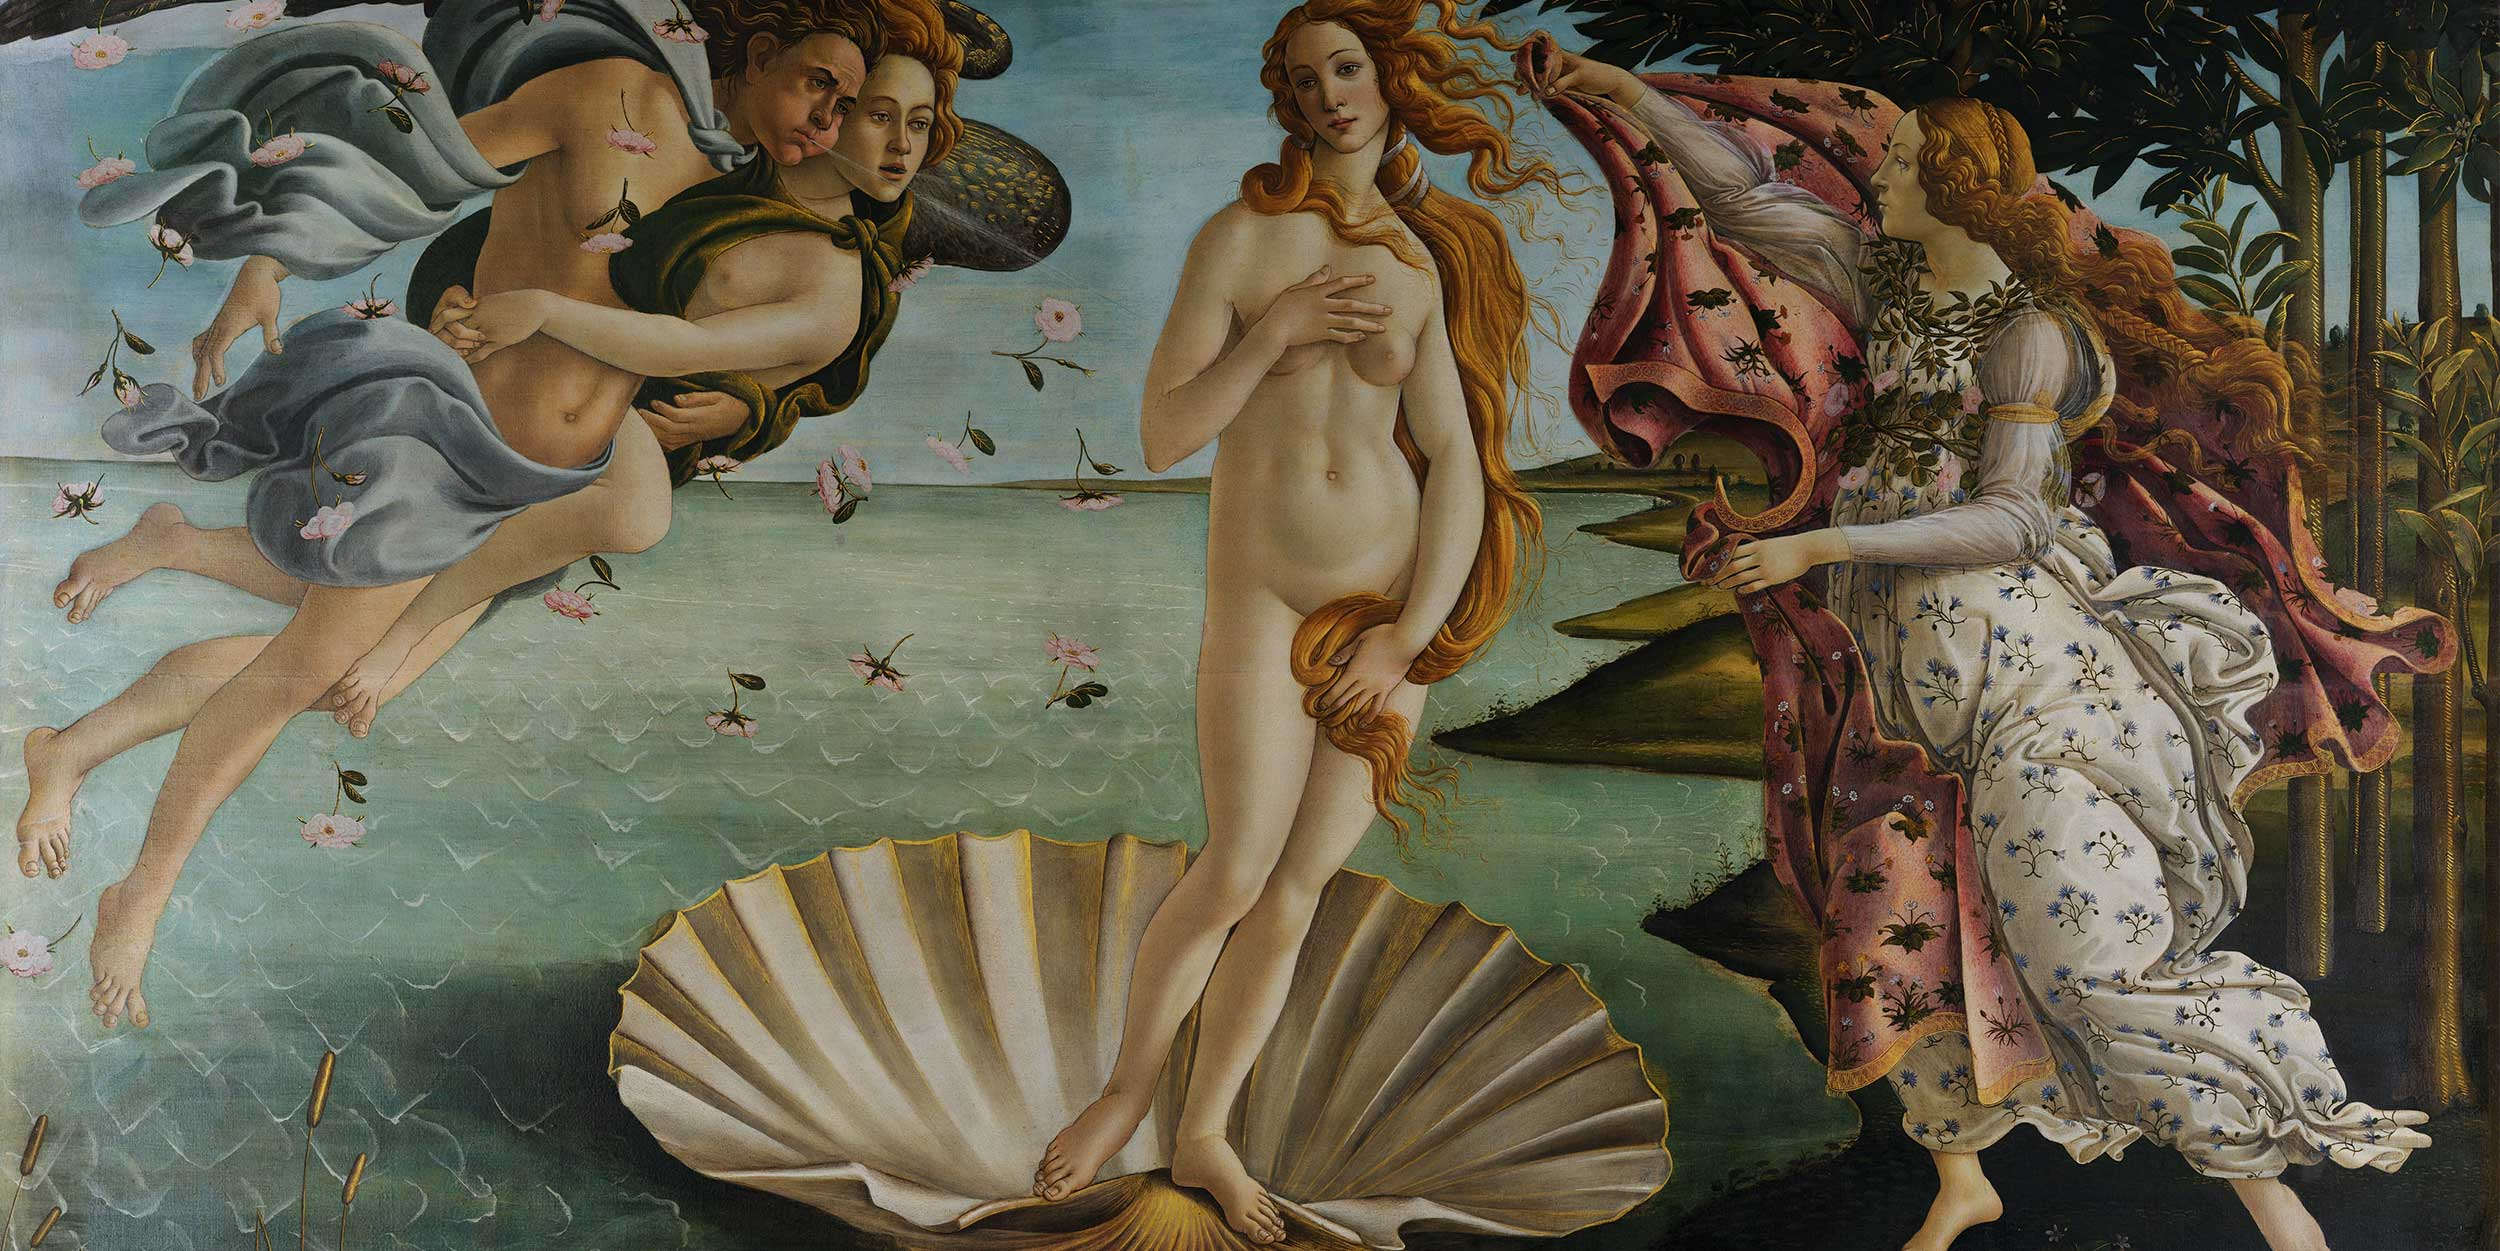 Stendhal Σύνδρομο: Μπορεί η τέχνη να μας αρρωστήσει